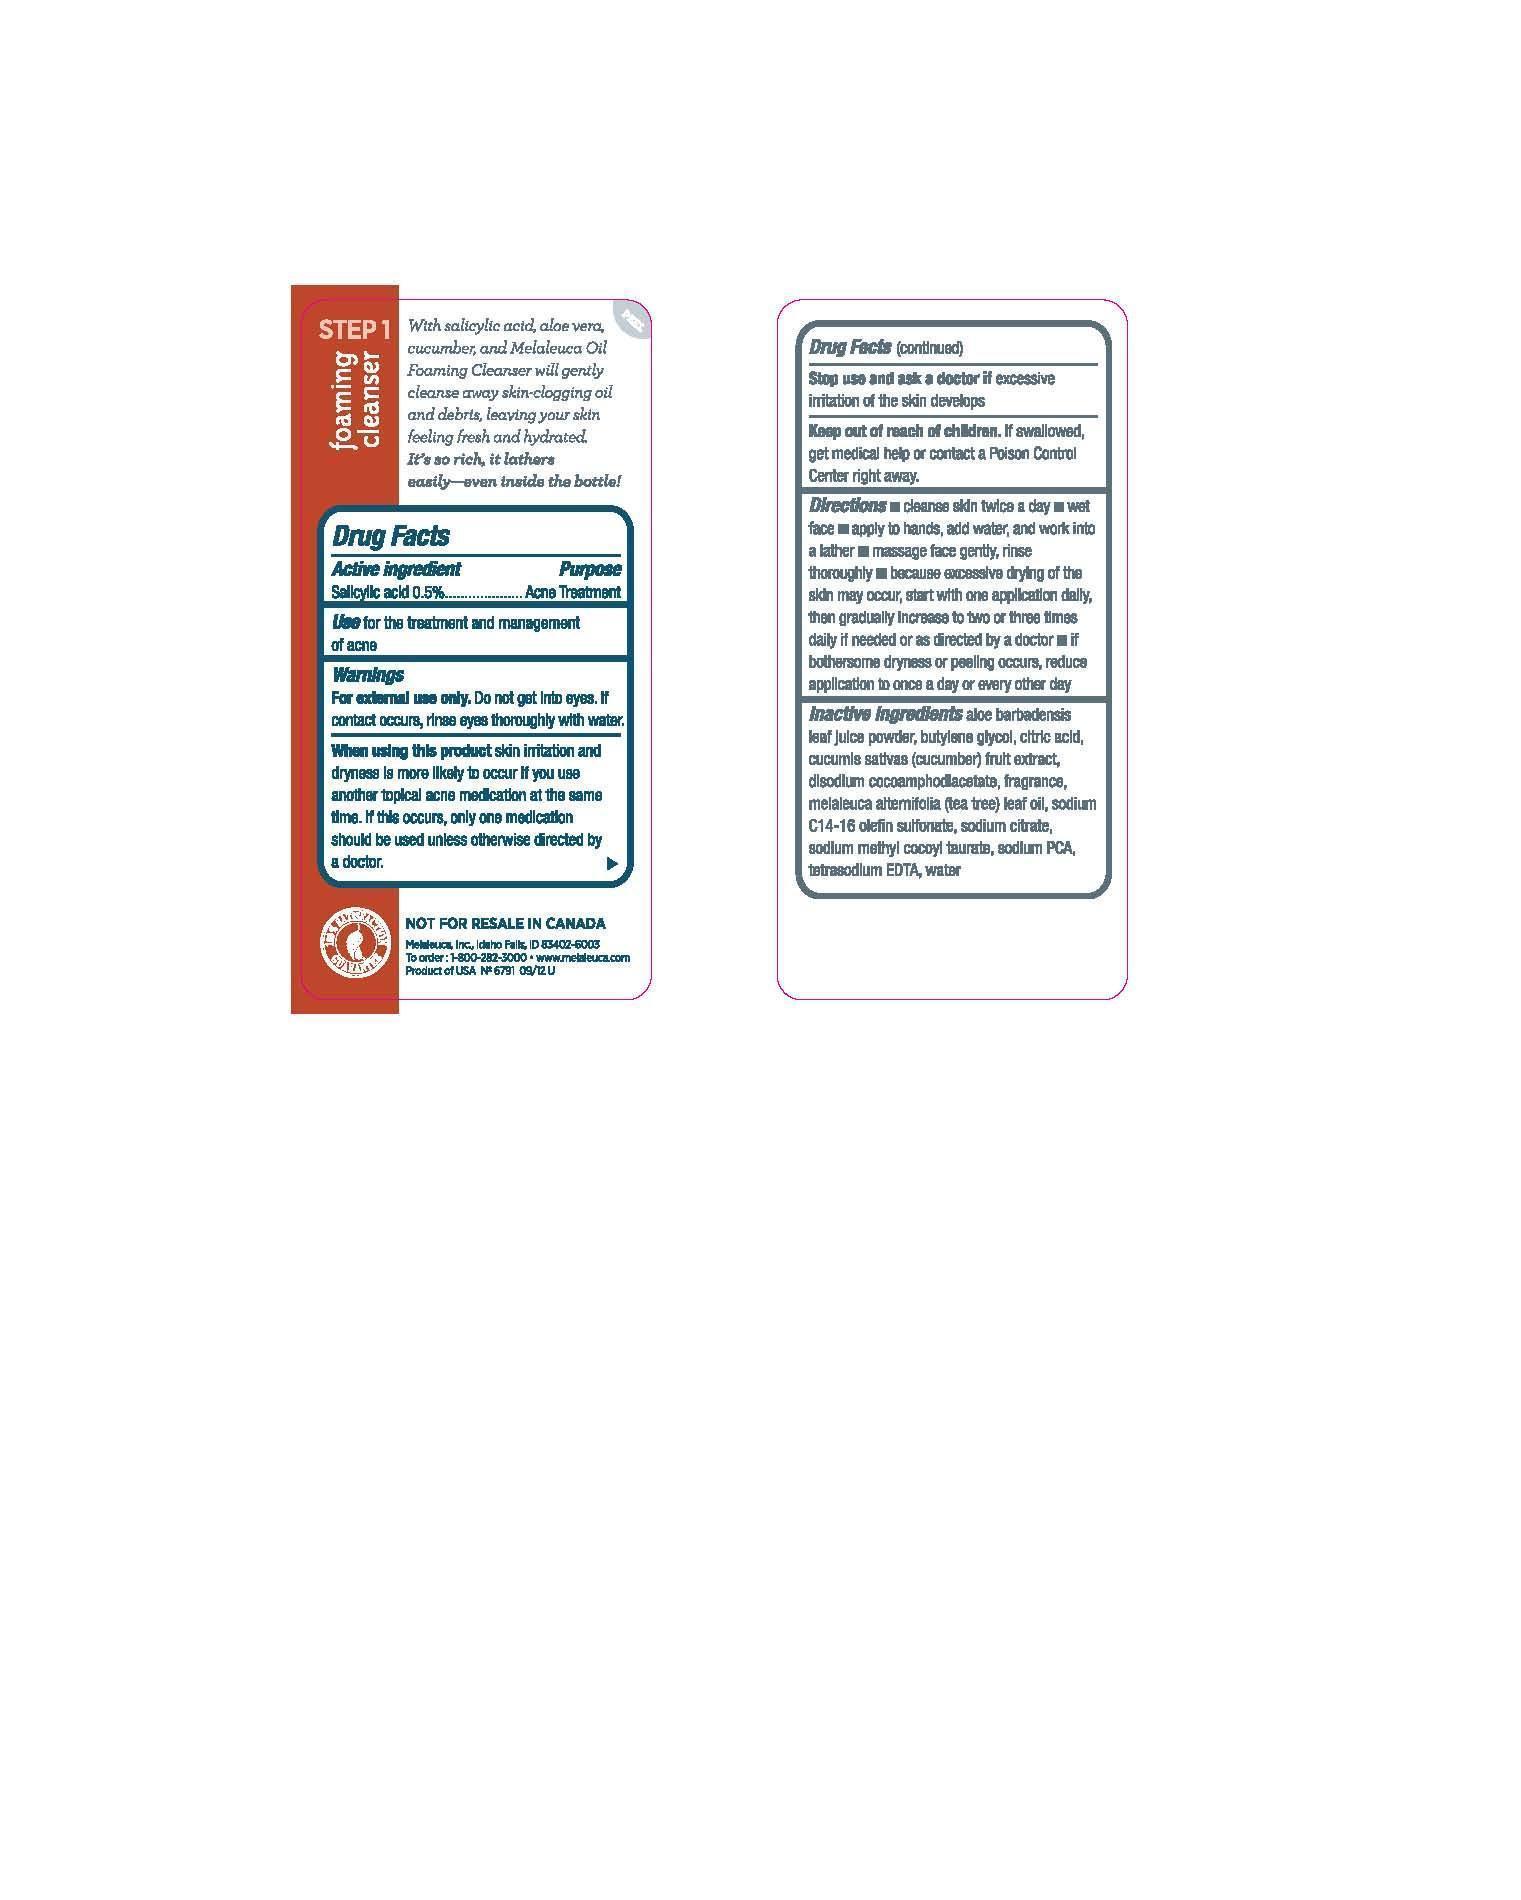 Clarity Clear Skin Essentials Foaming Cleanser (Salicylic Acid) Liquid [Melaleuca, Inc.]